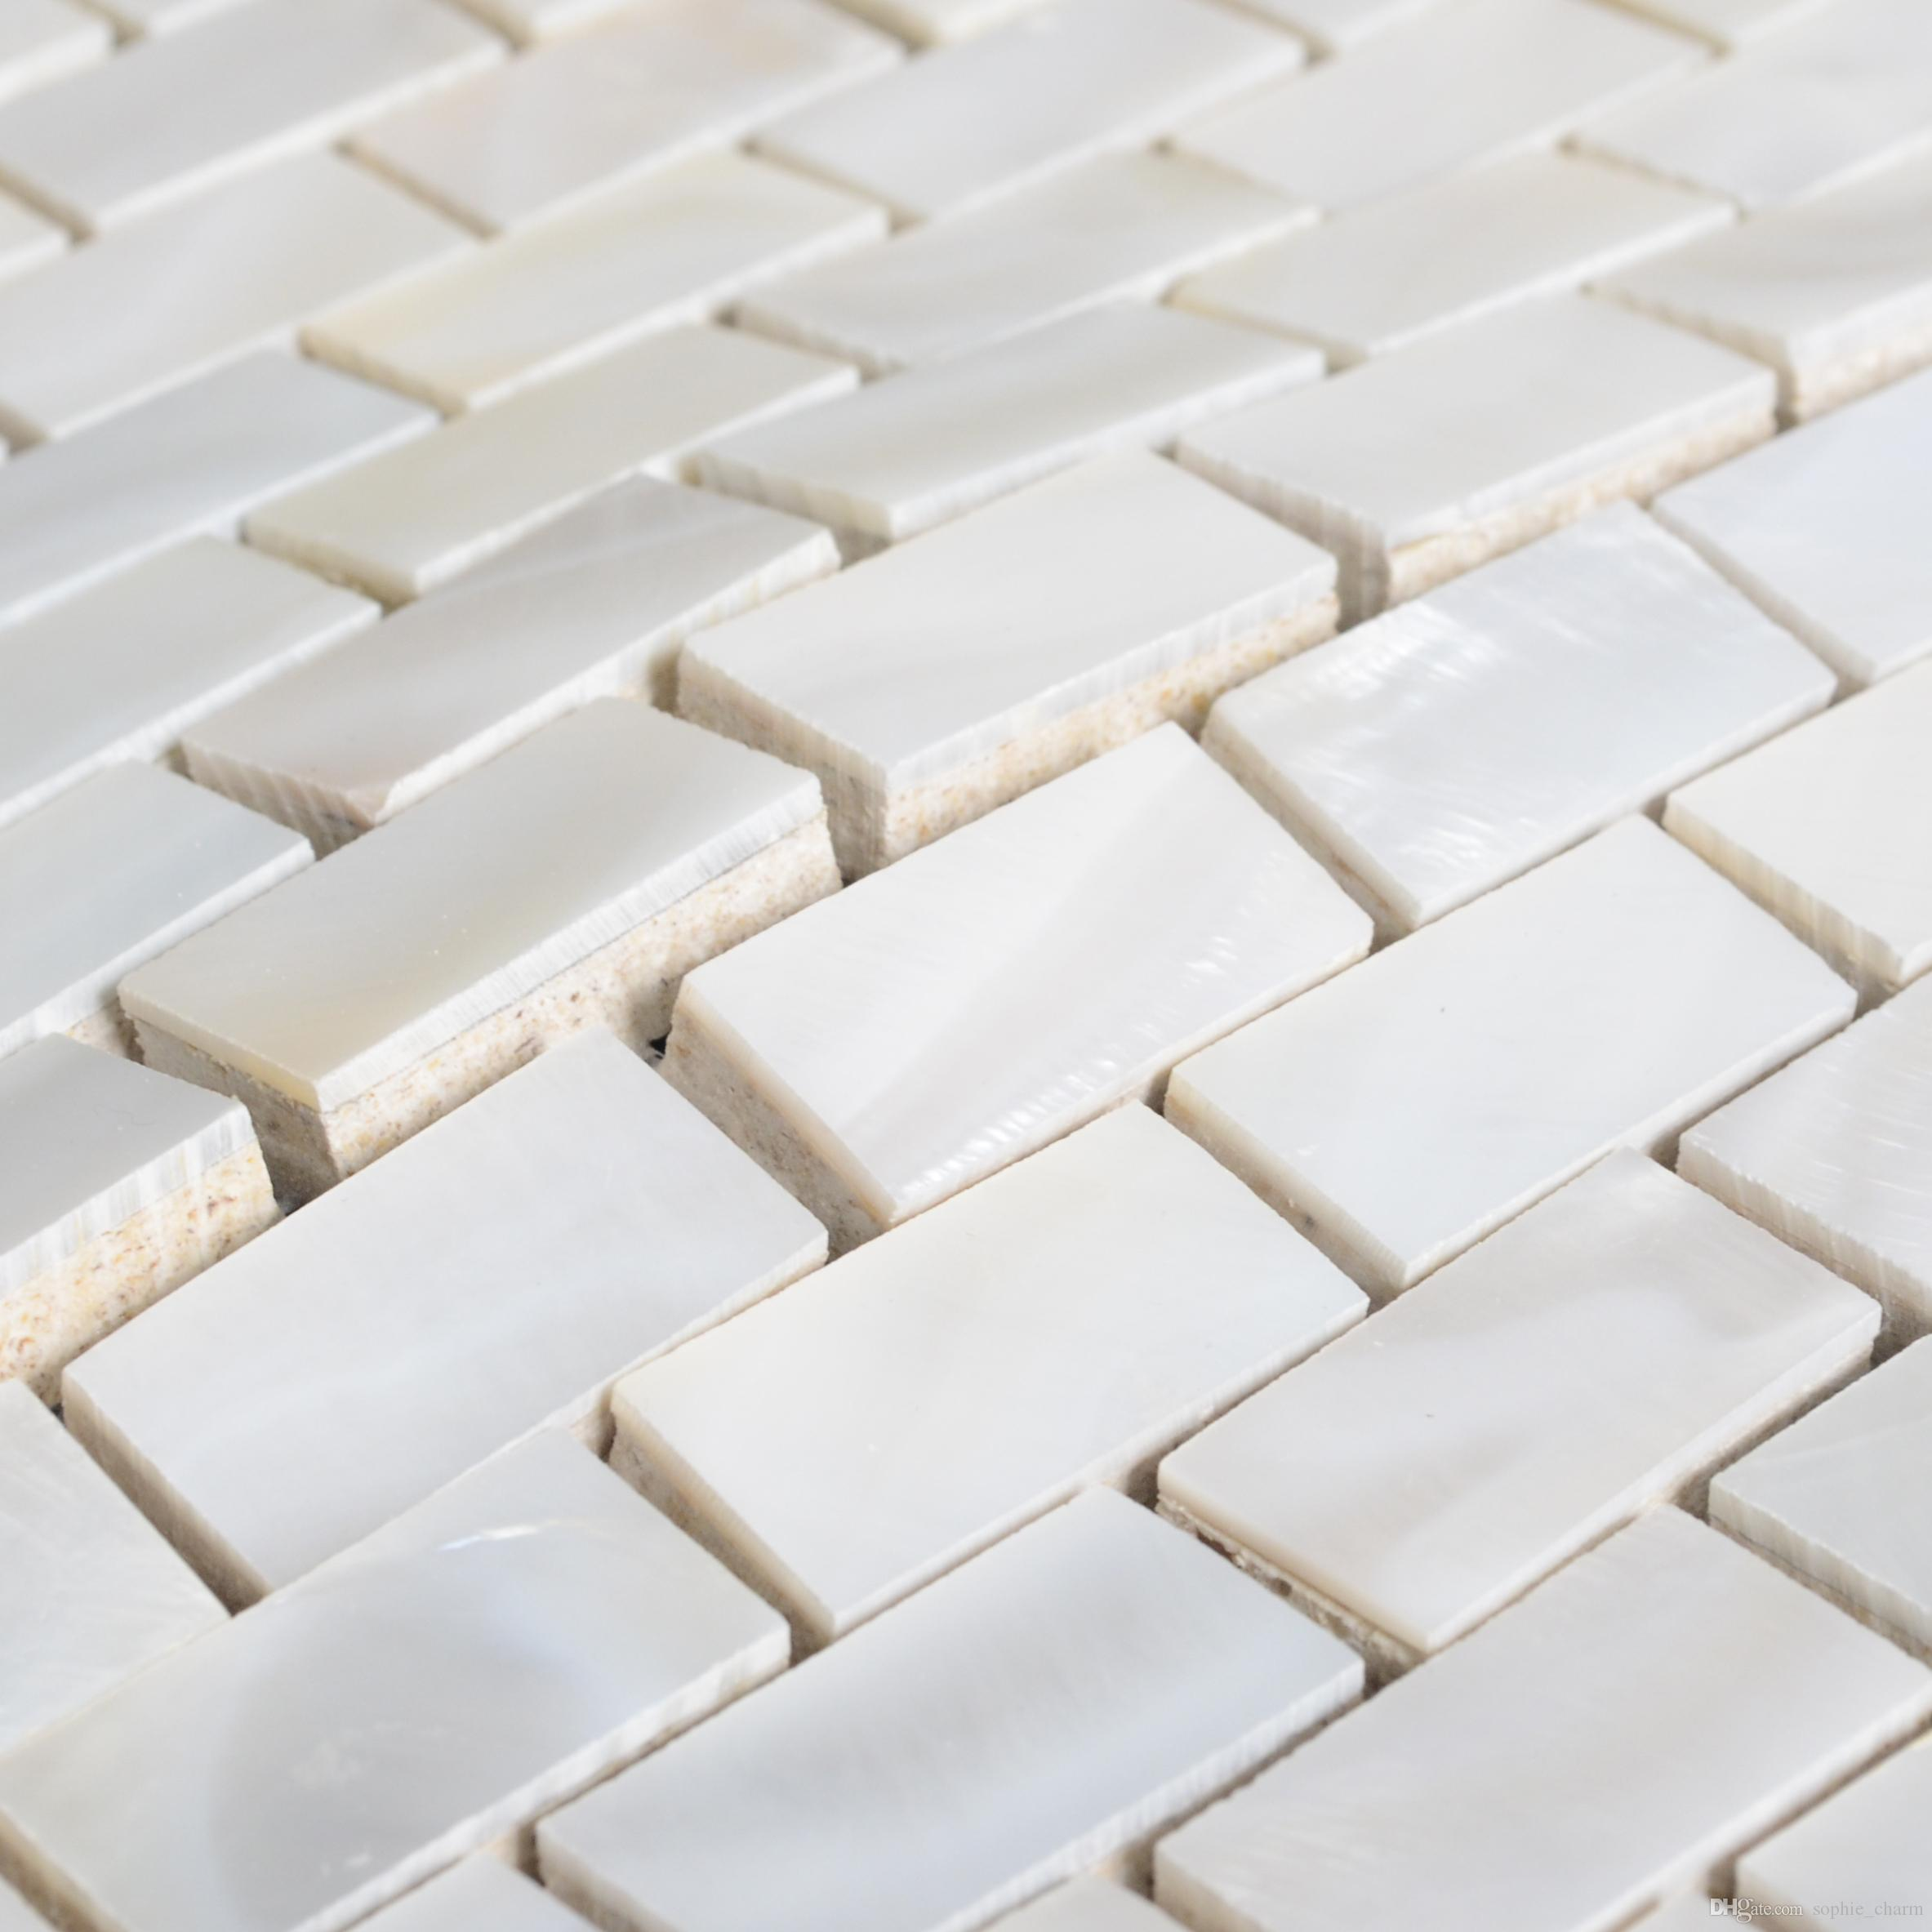 15x30mm brick white Mother of pearl bathroom tiles MOP129 pearl shell wall tiles backsplash kitchen